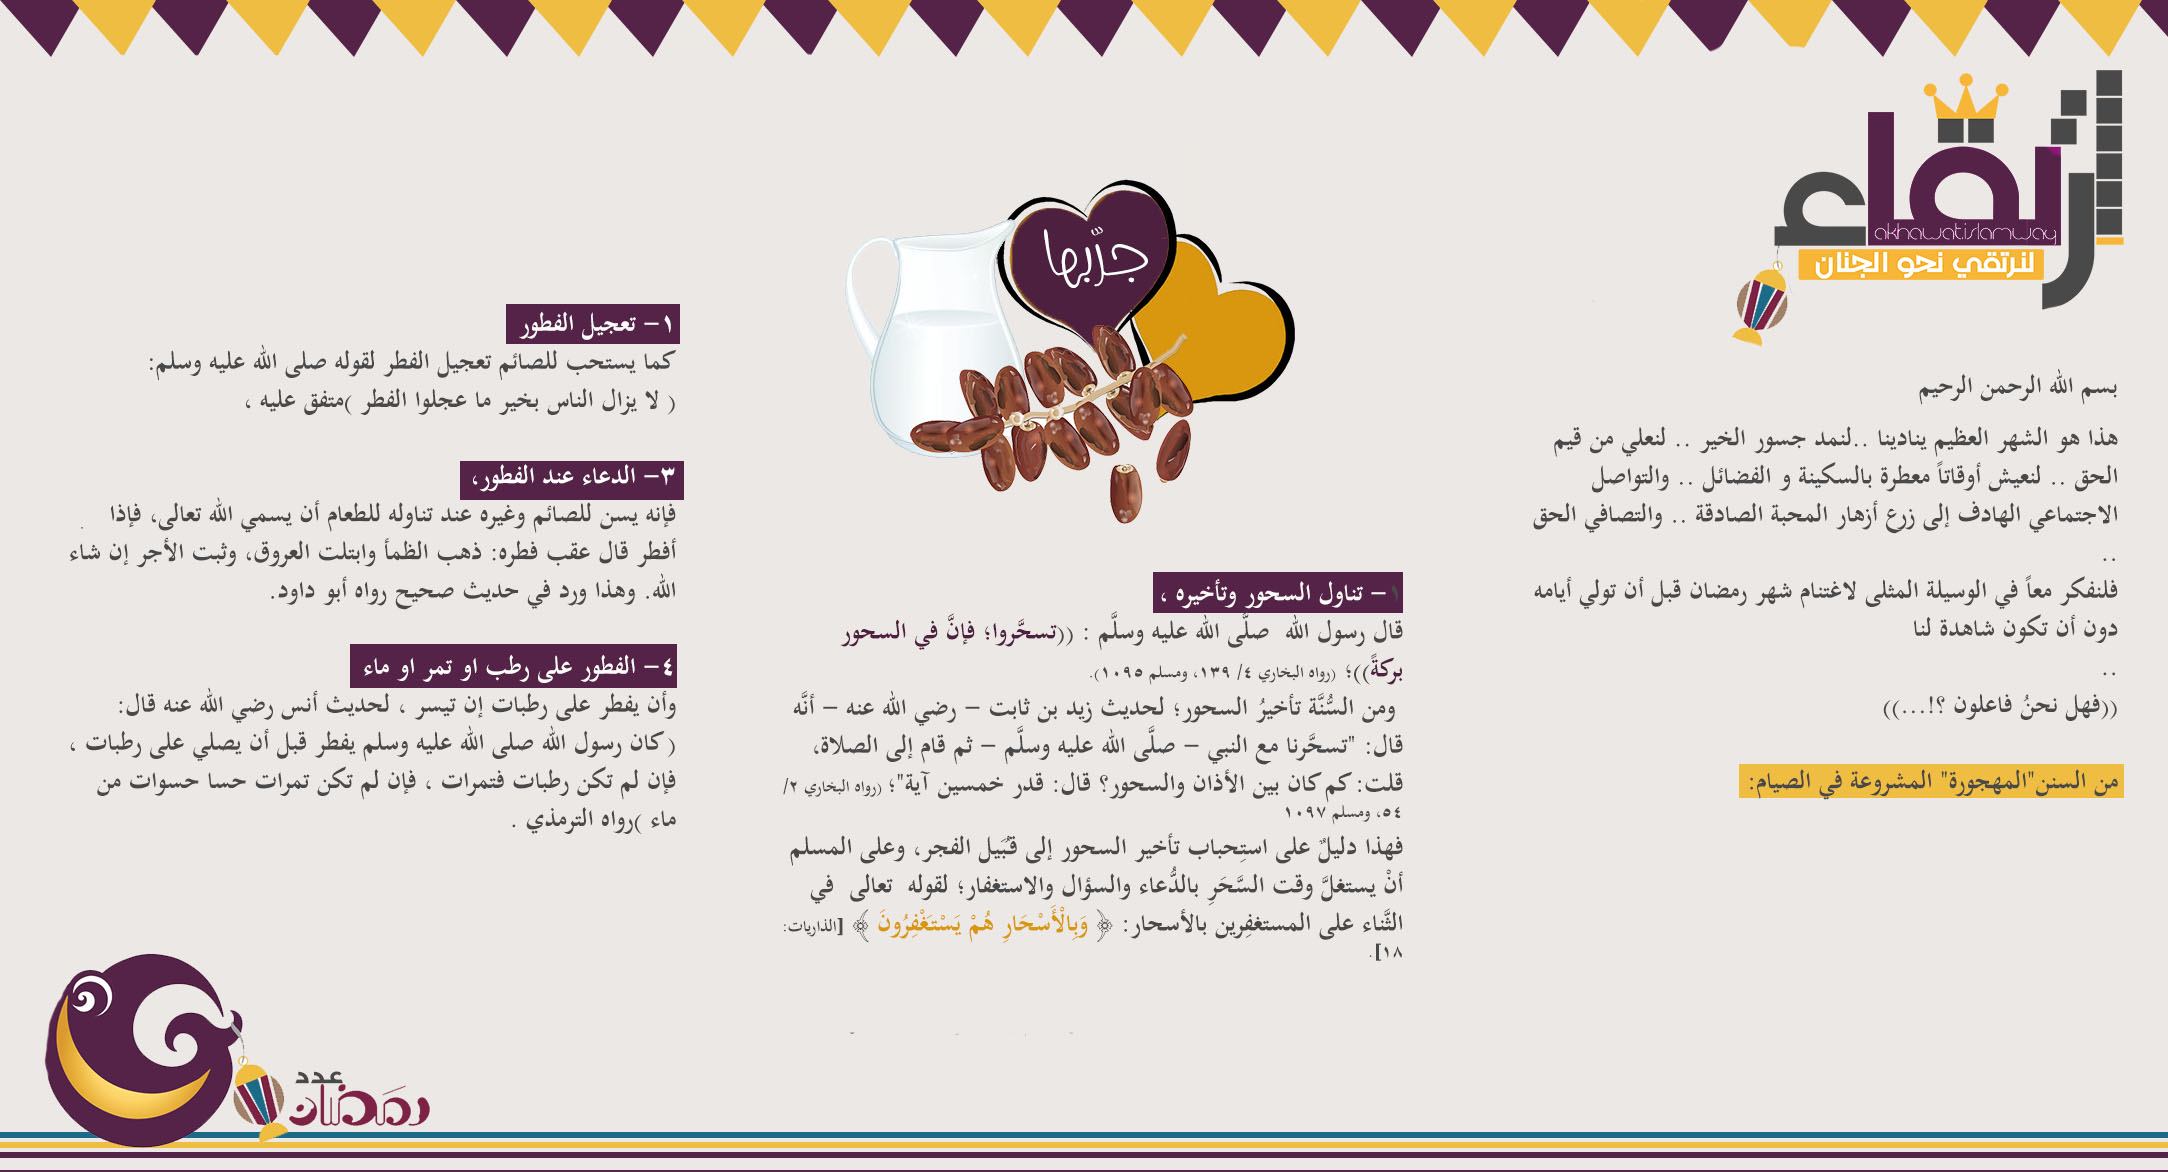 akhawat_islamway_1494578867__2.jpg